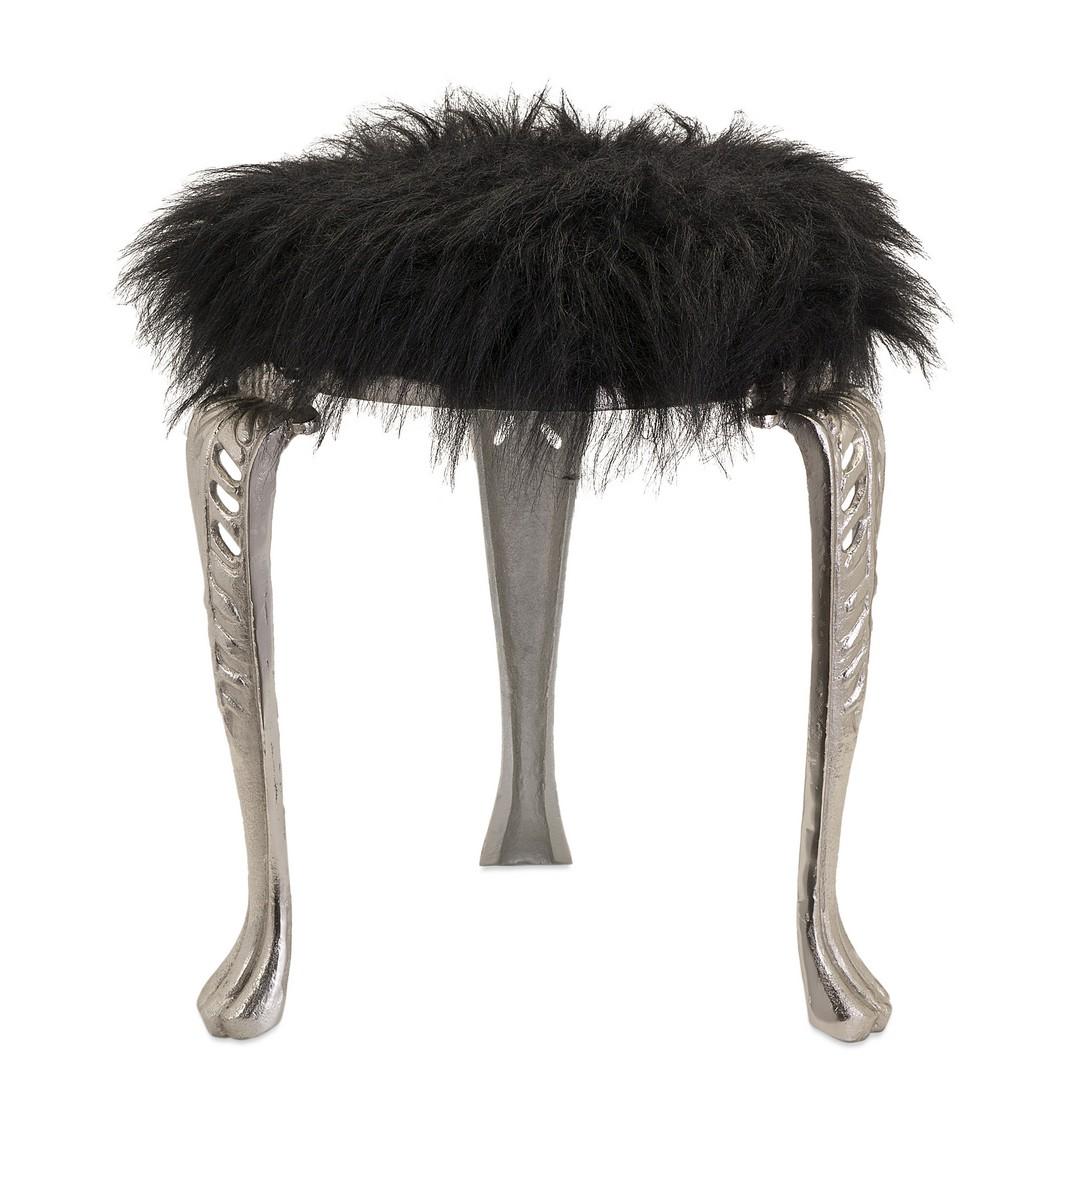 IMAX Nikki Chu Neely Black Fur Stool